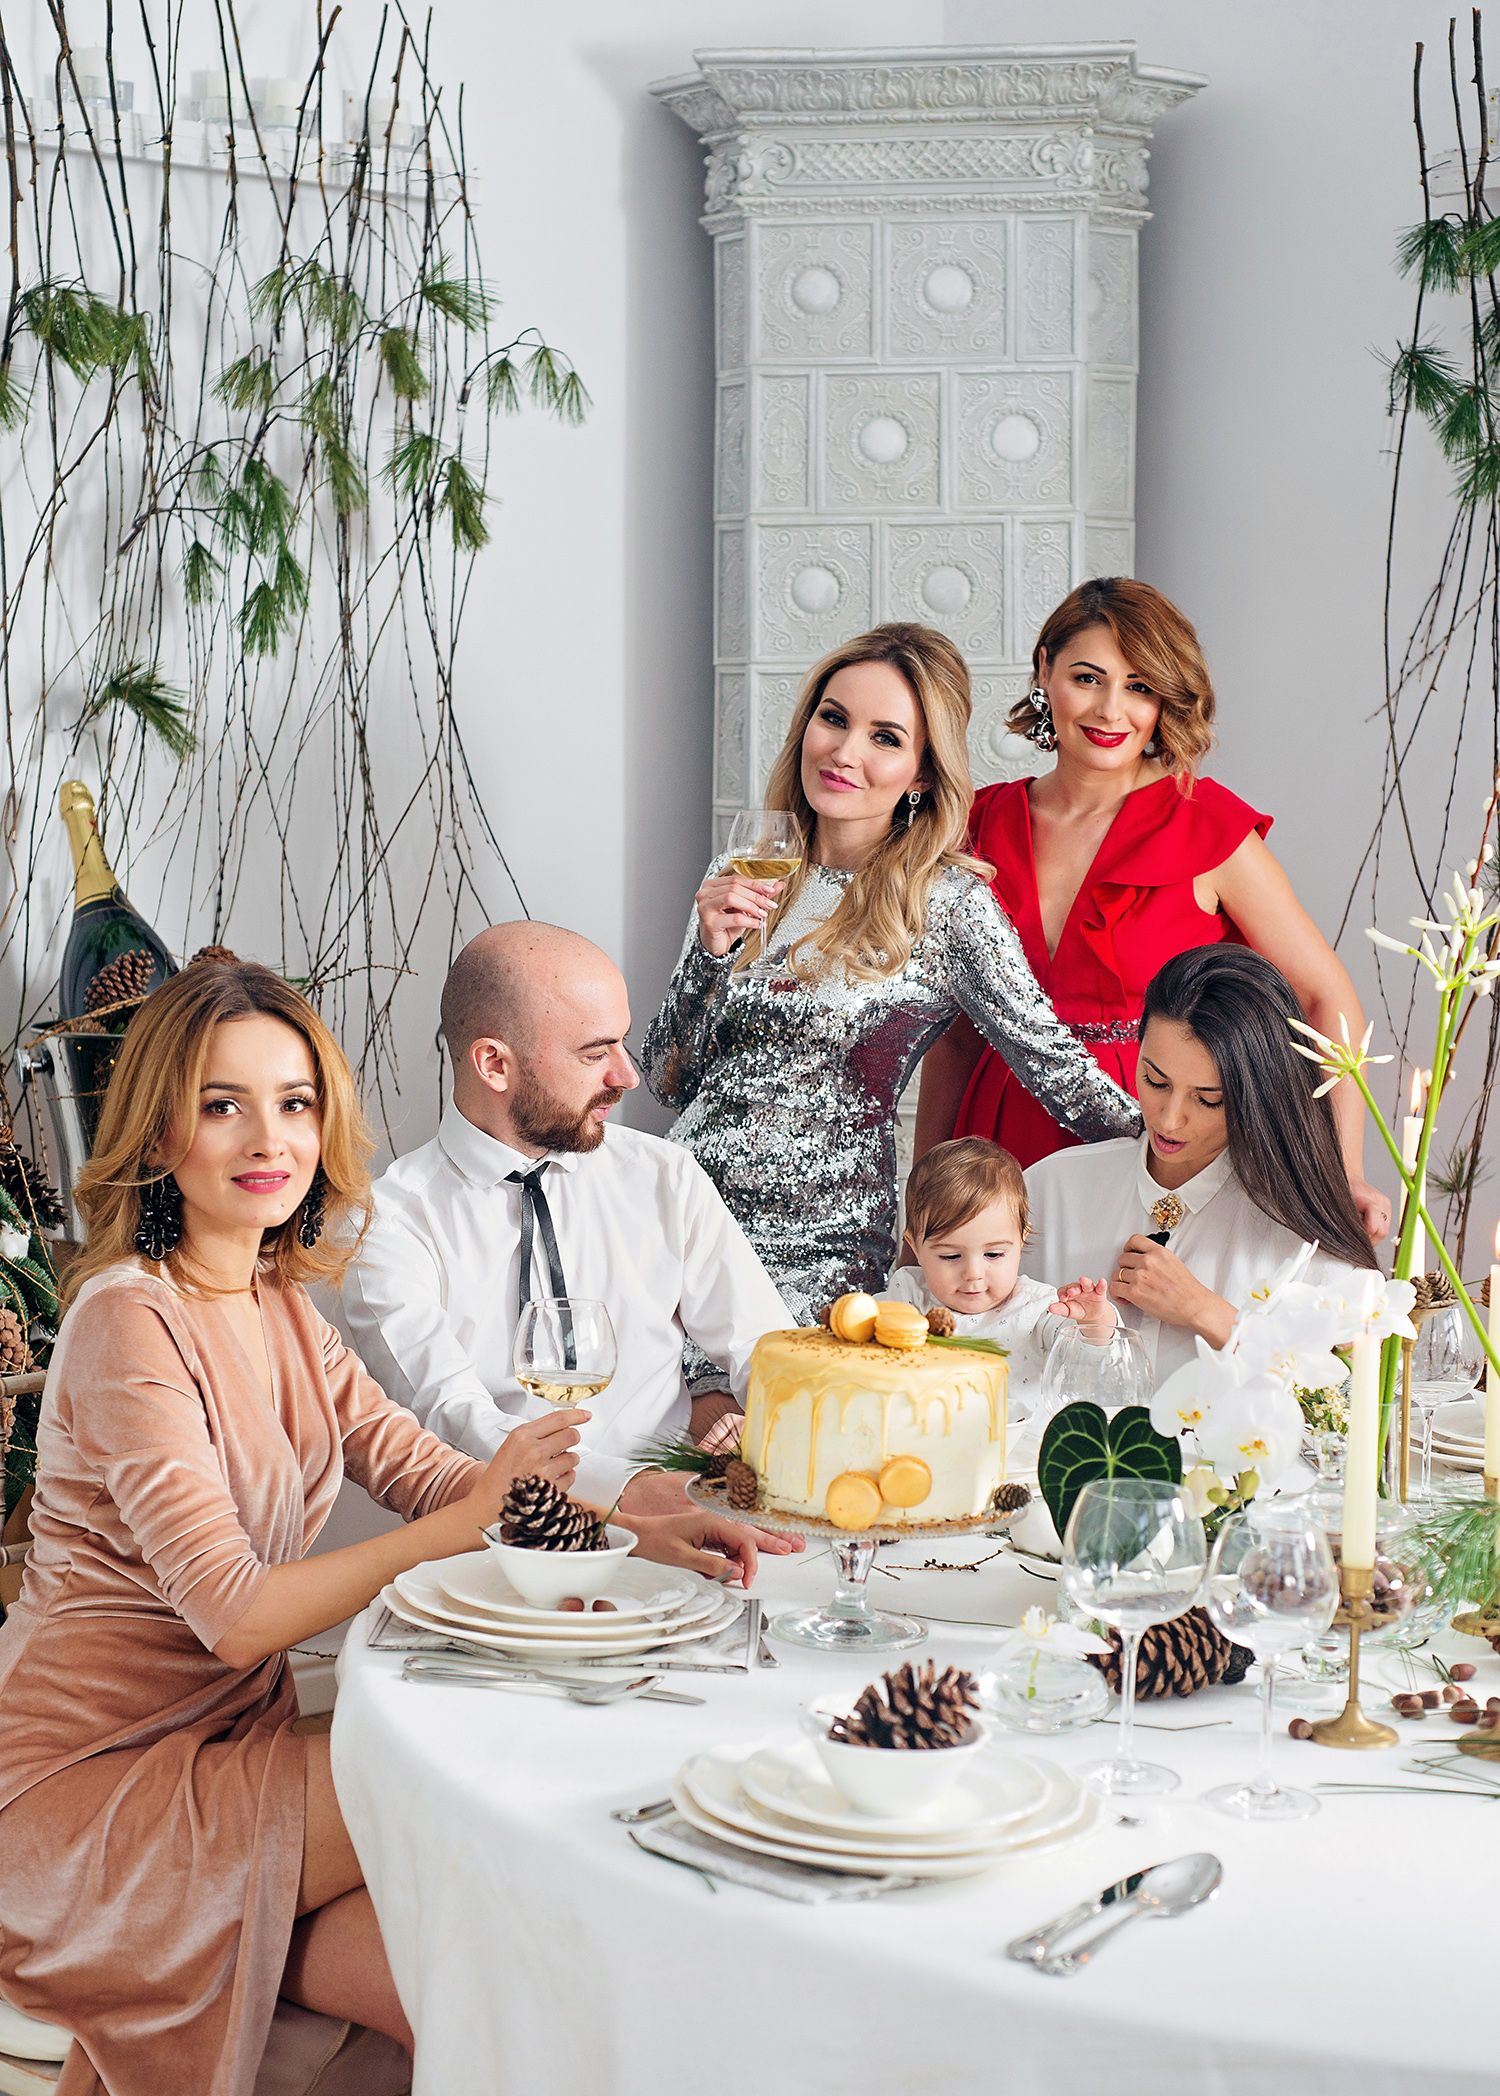 #christmas #alexandrabenga #elenasandor #madalinaavramescu #adipop #friends #december #christmasthree #presents #iris #florariairis #manuri #sequins #dress #fashion #christmaslook #fashion